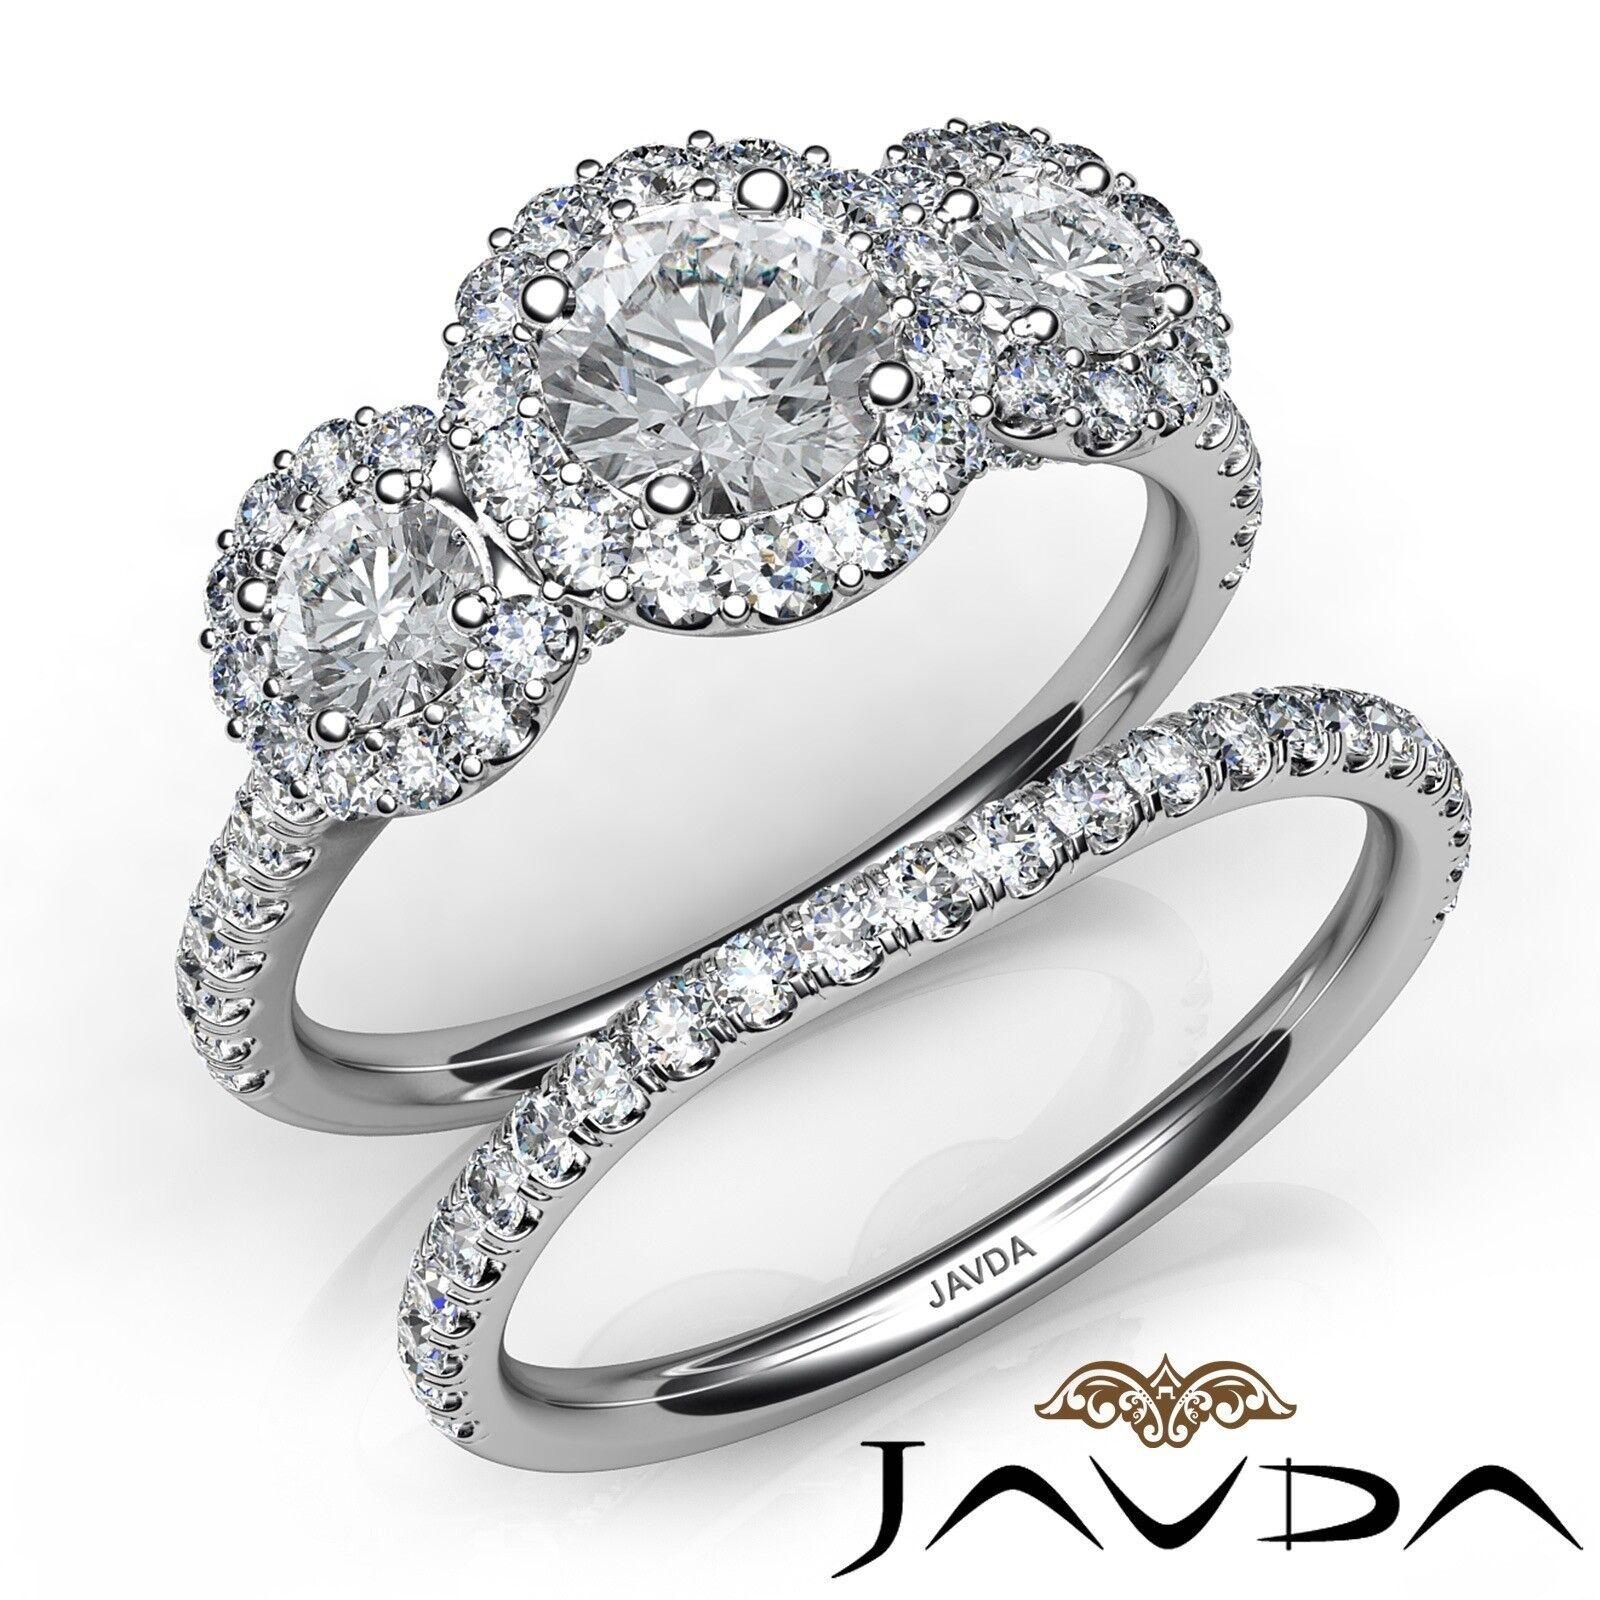 2.05ct 3Stone Halo Bridal Set Round Diamond Engagement Ring GIA G-VS2 White Gold